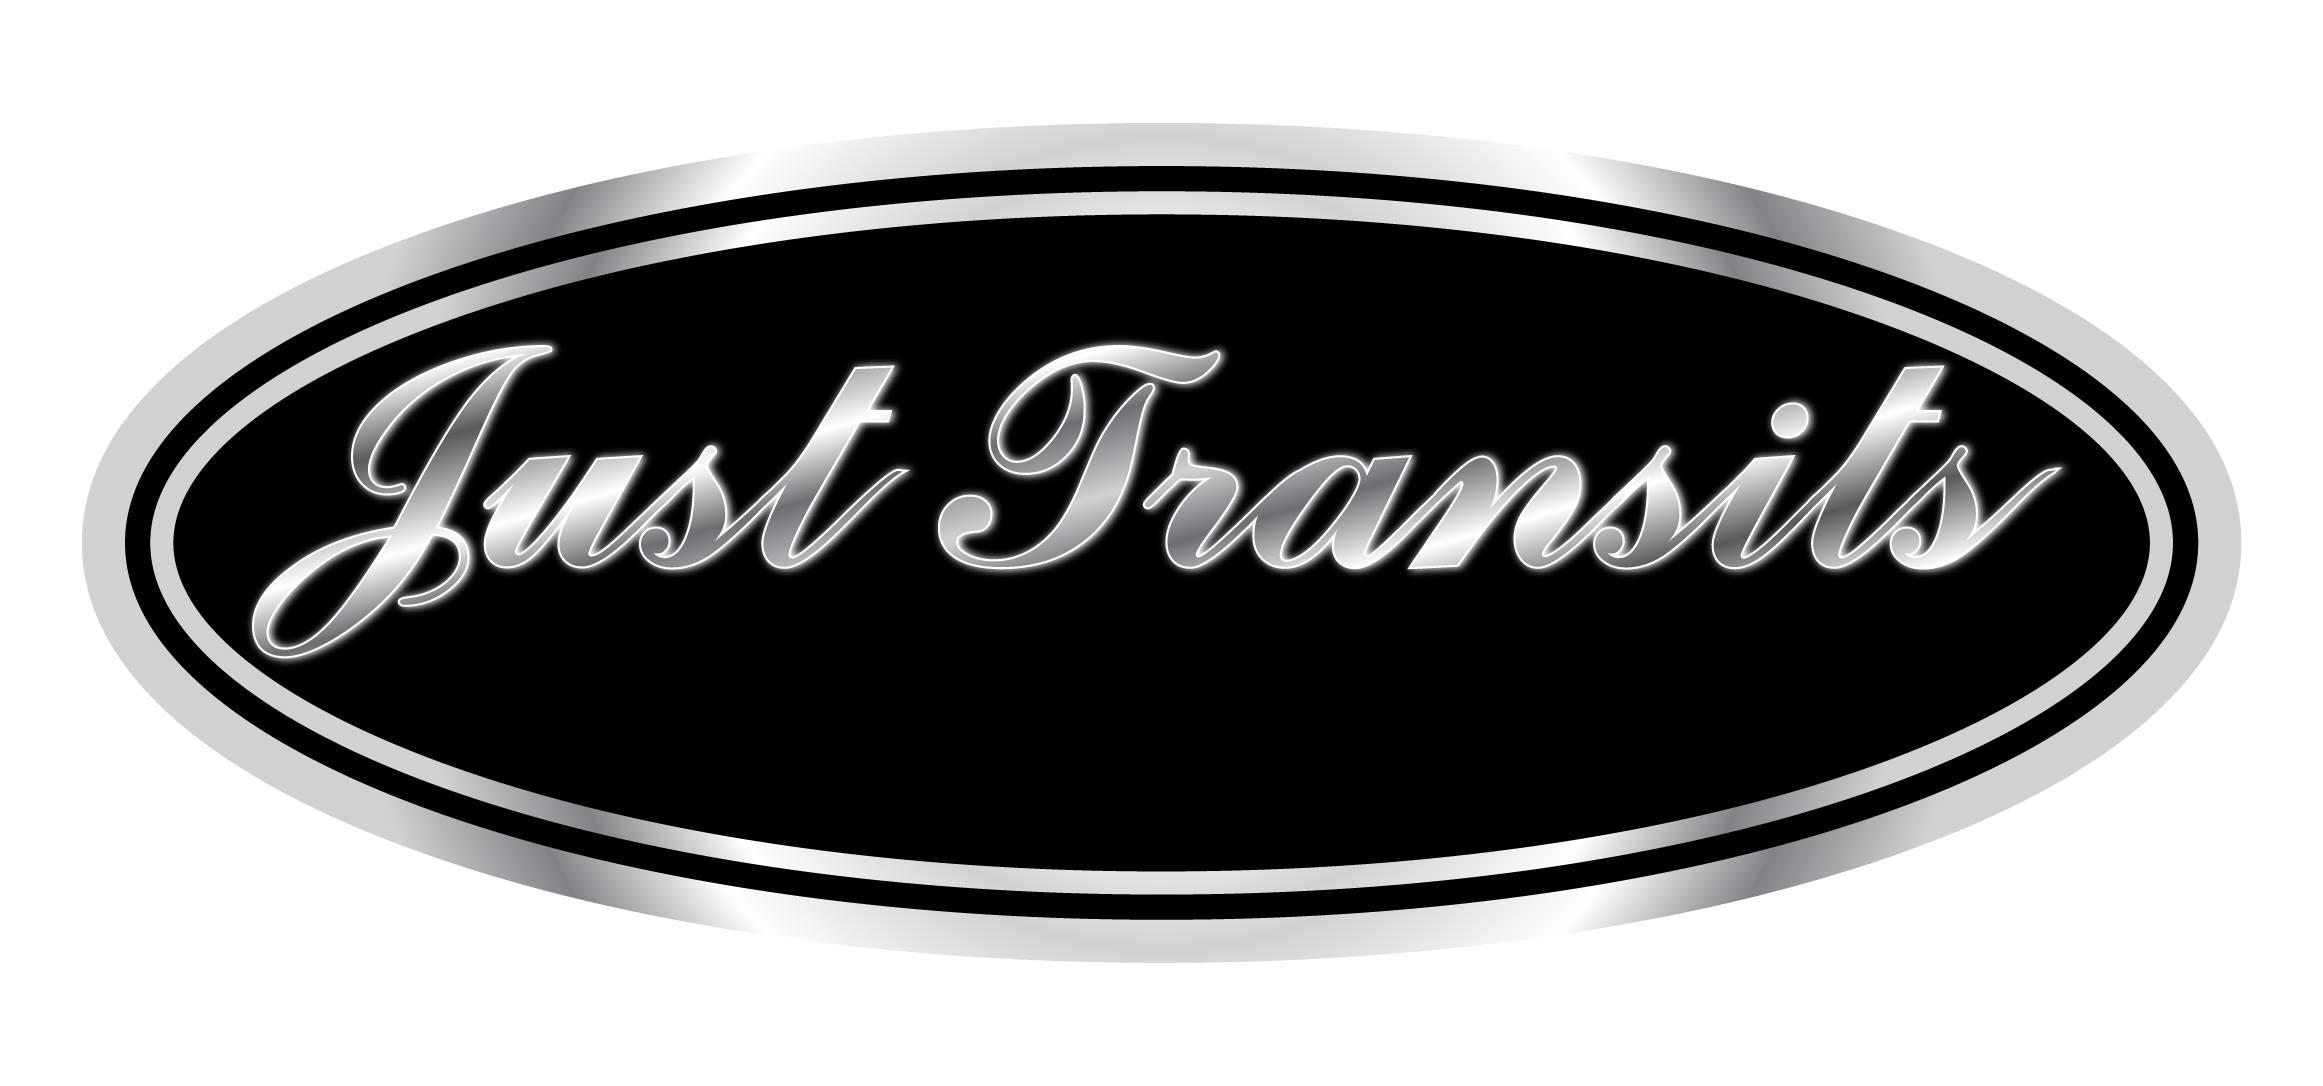 justtransit logo